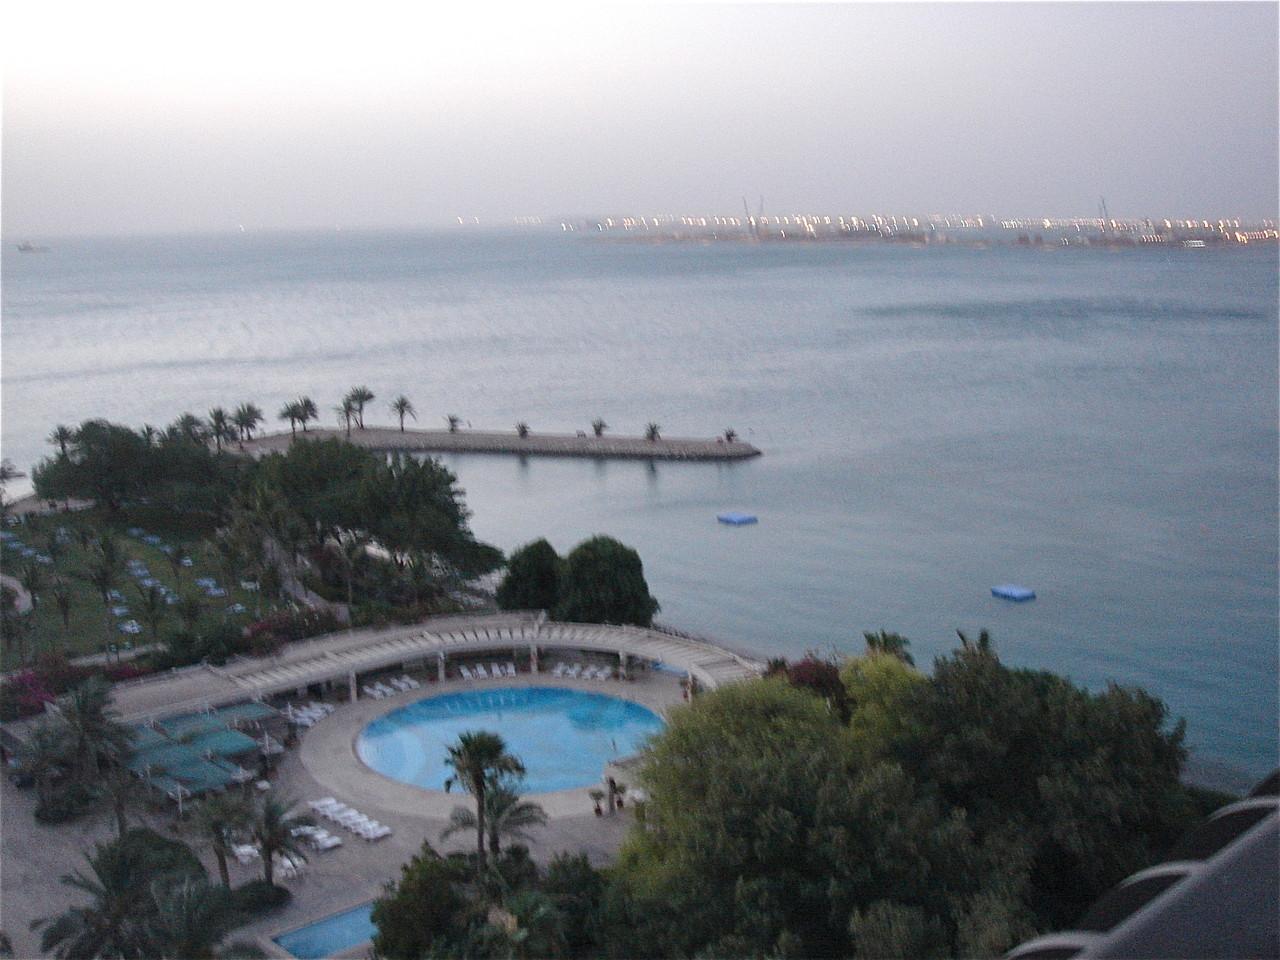 view from room, Sheraton Doha, Qatar